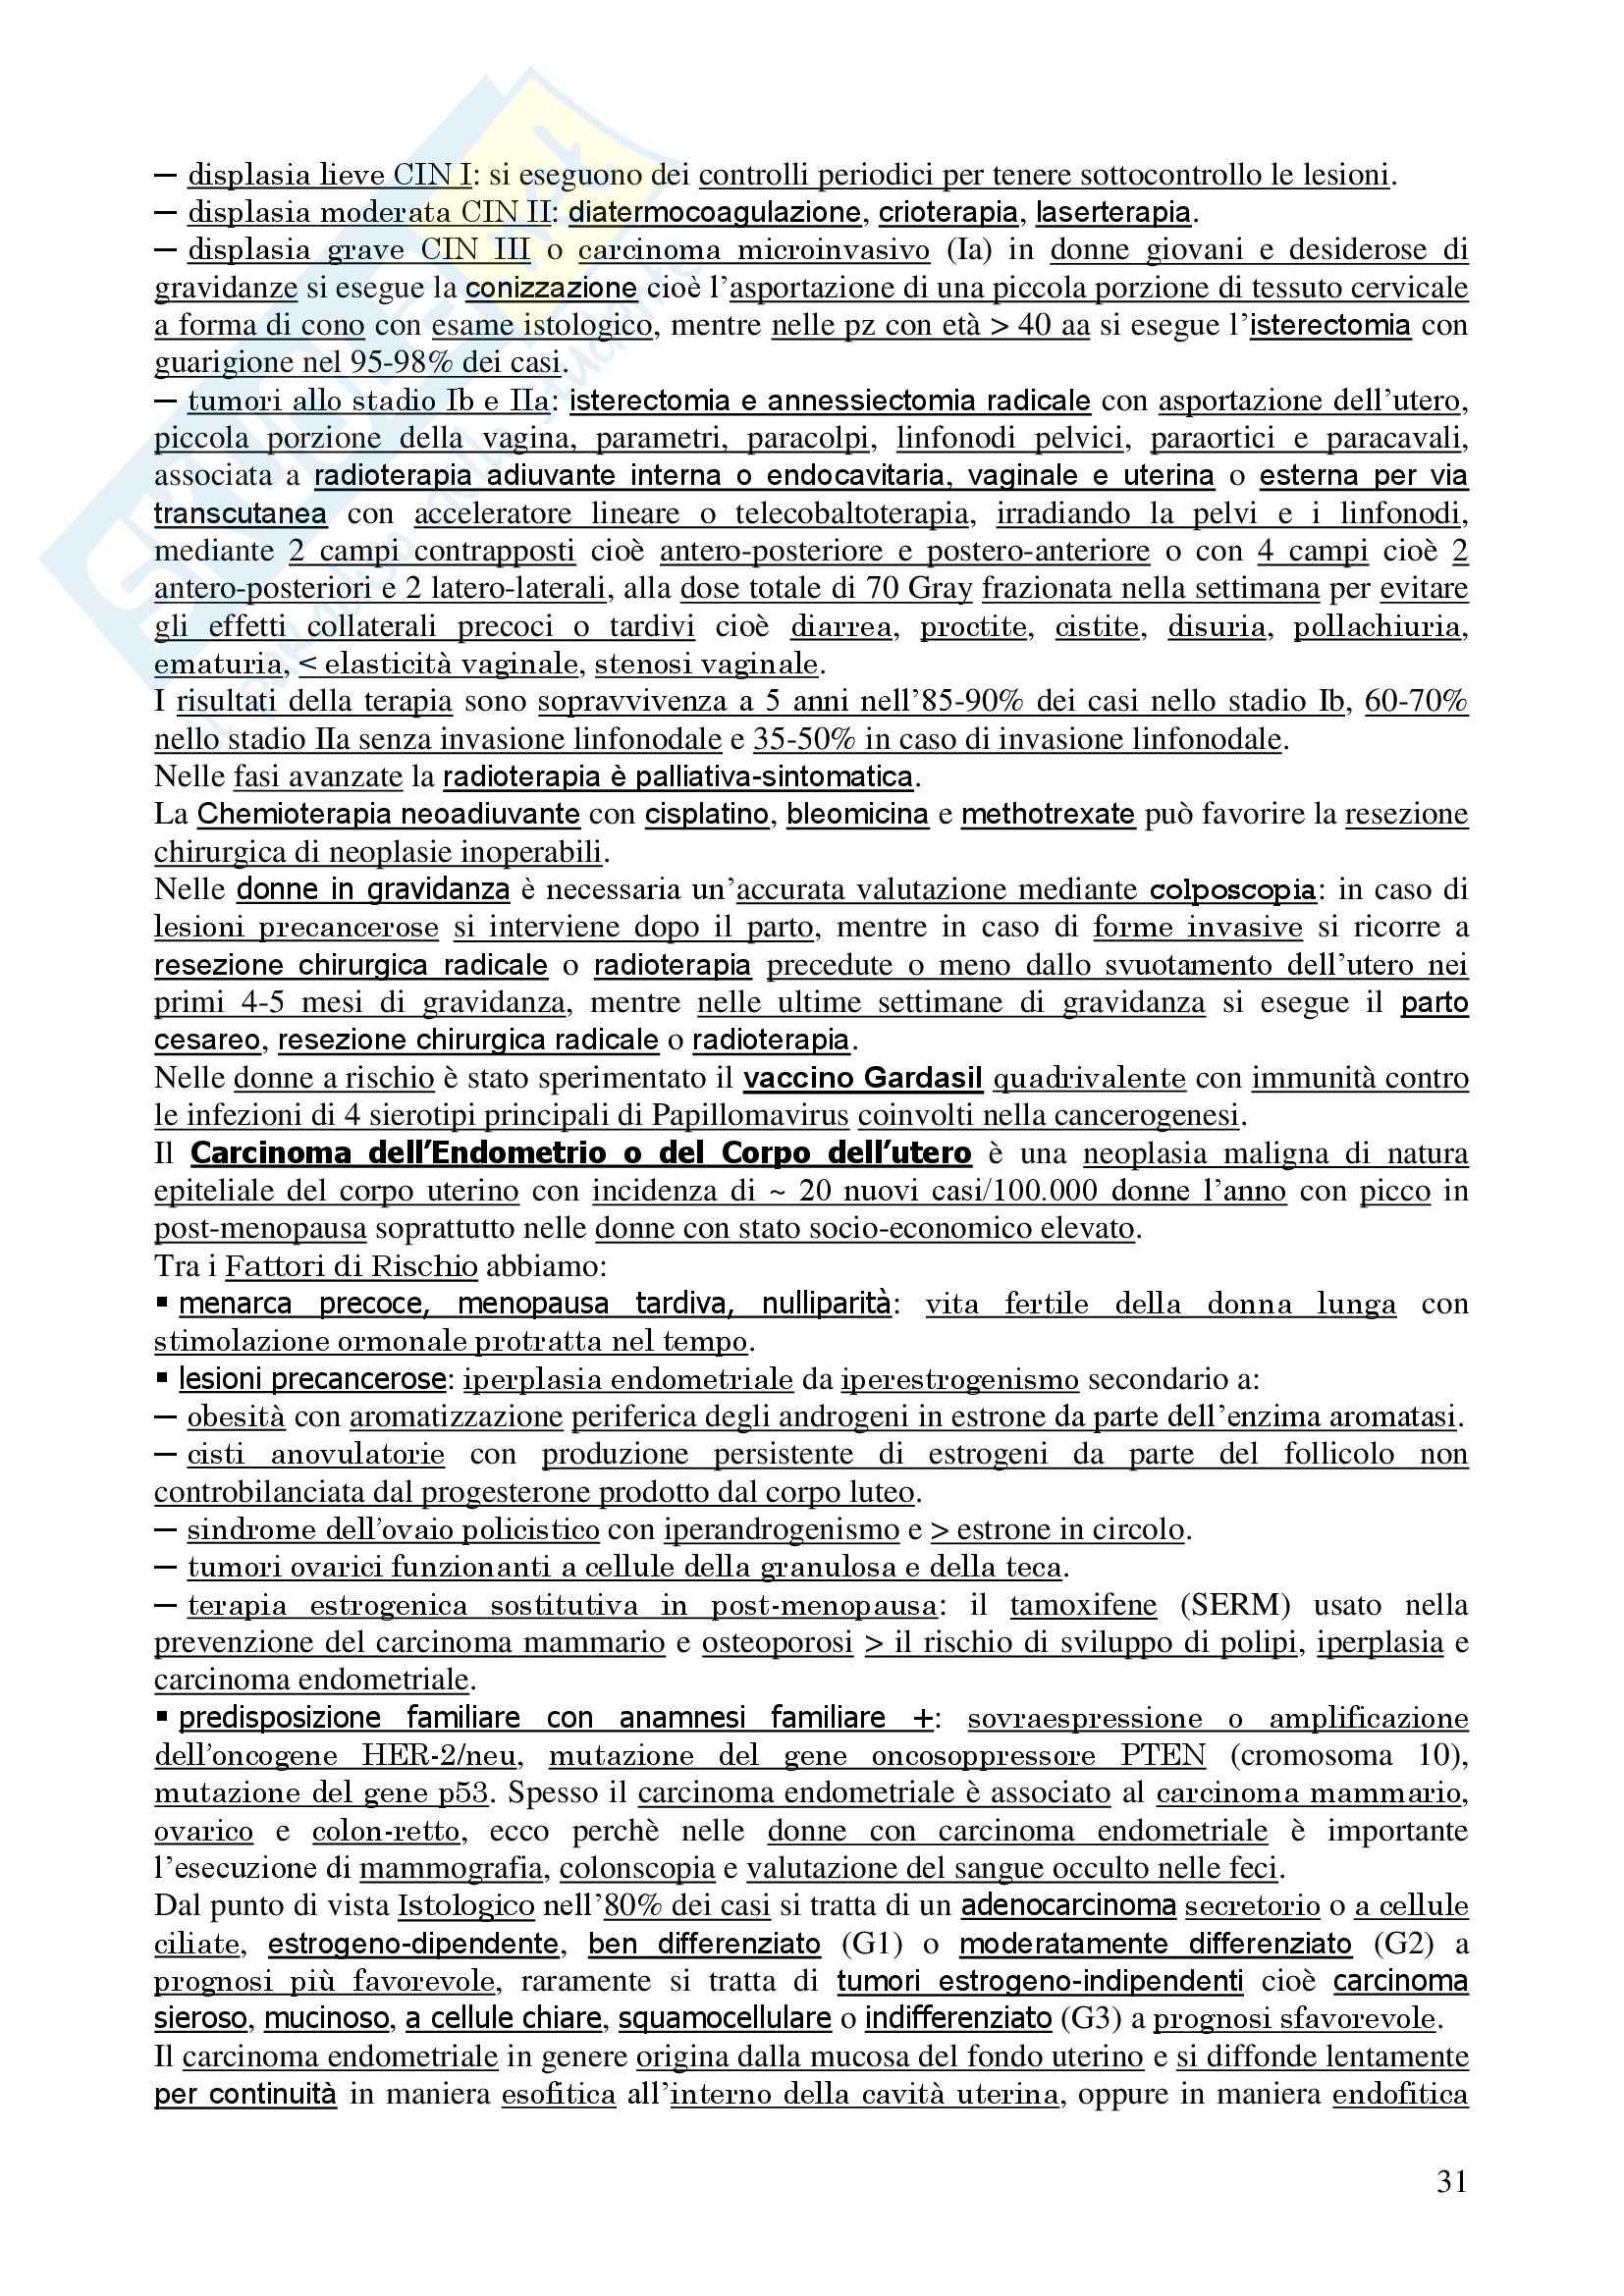 Ginecologia e Ostetricia - Appunti Pag. 31